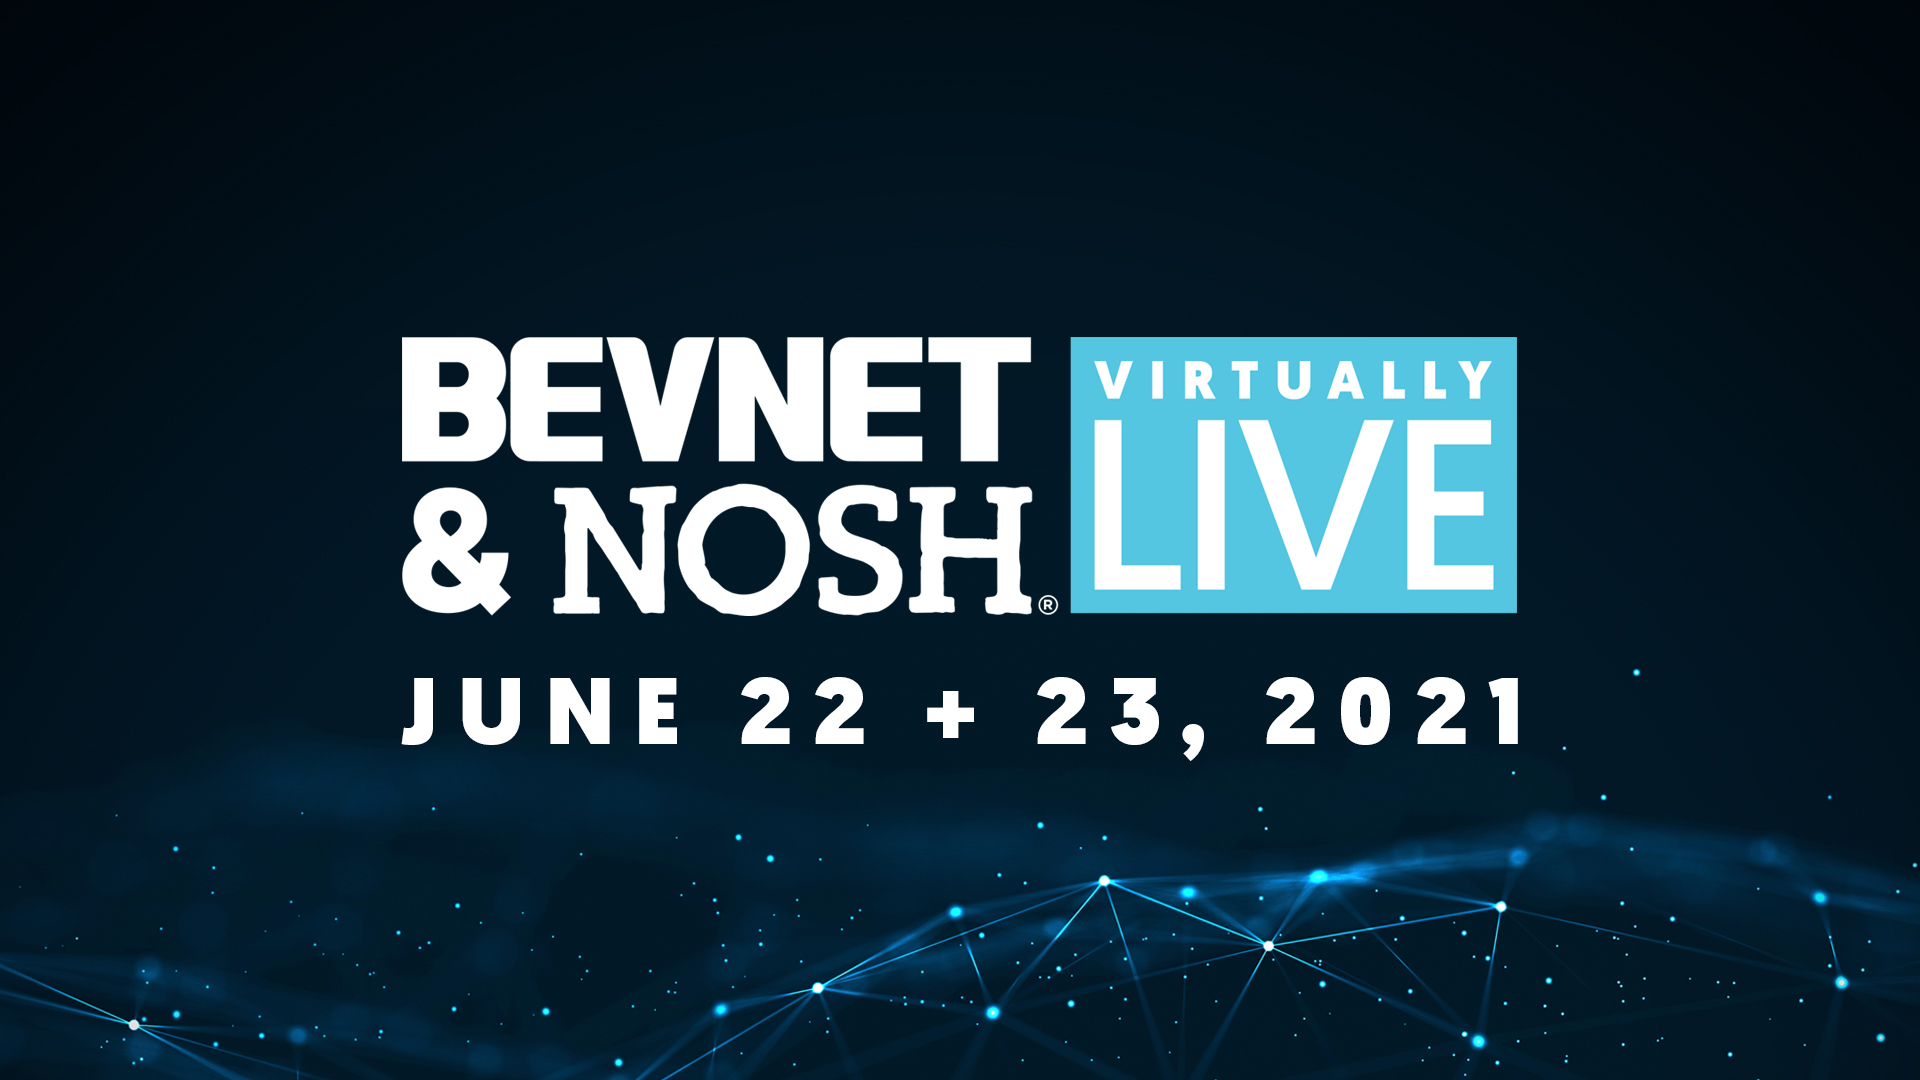 BevNET & NOSH Virtually Live